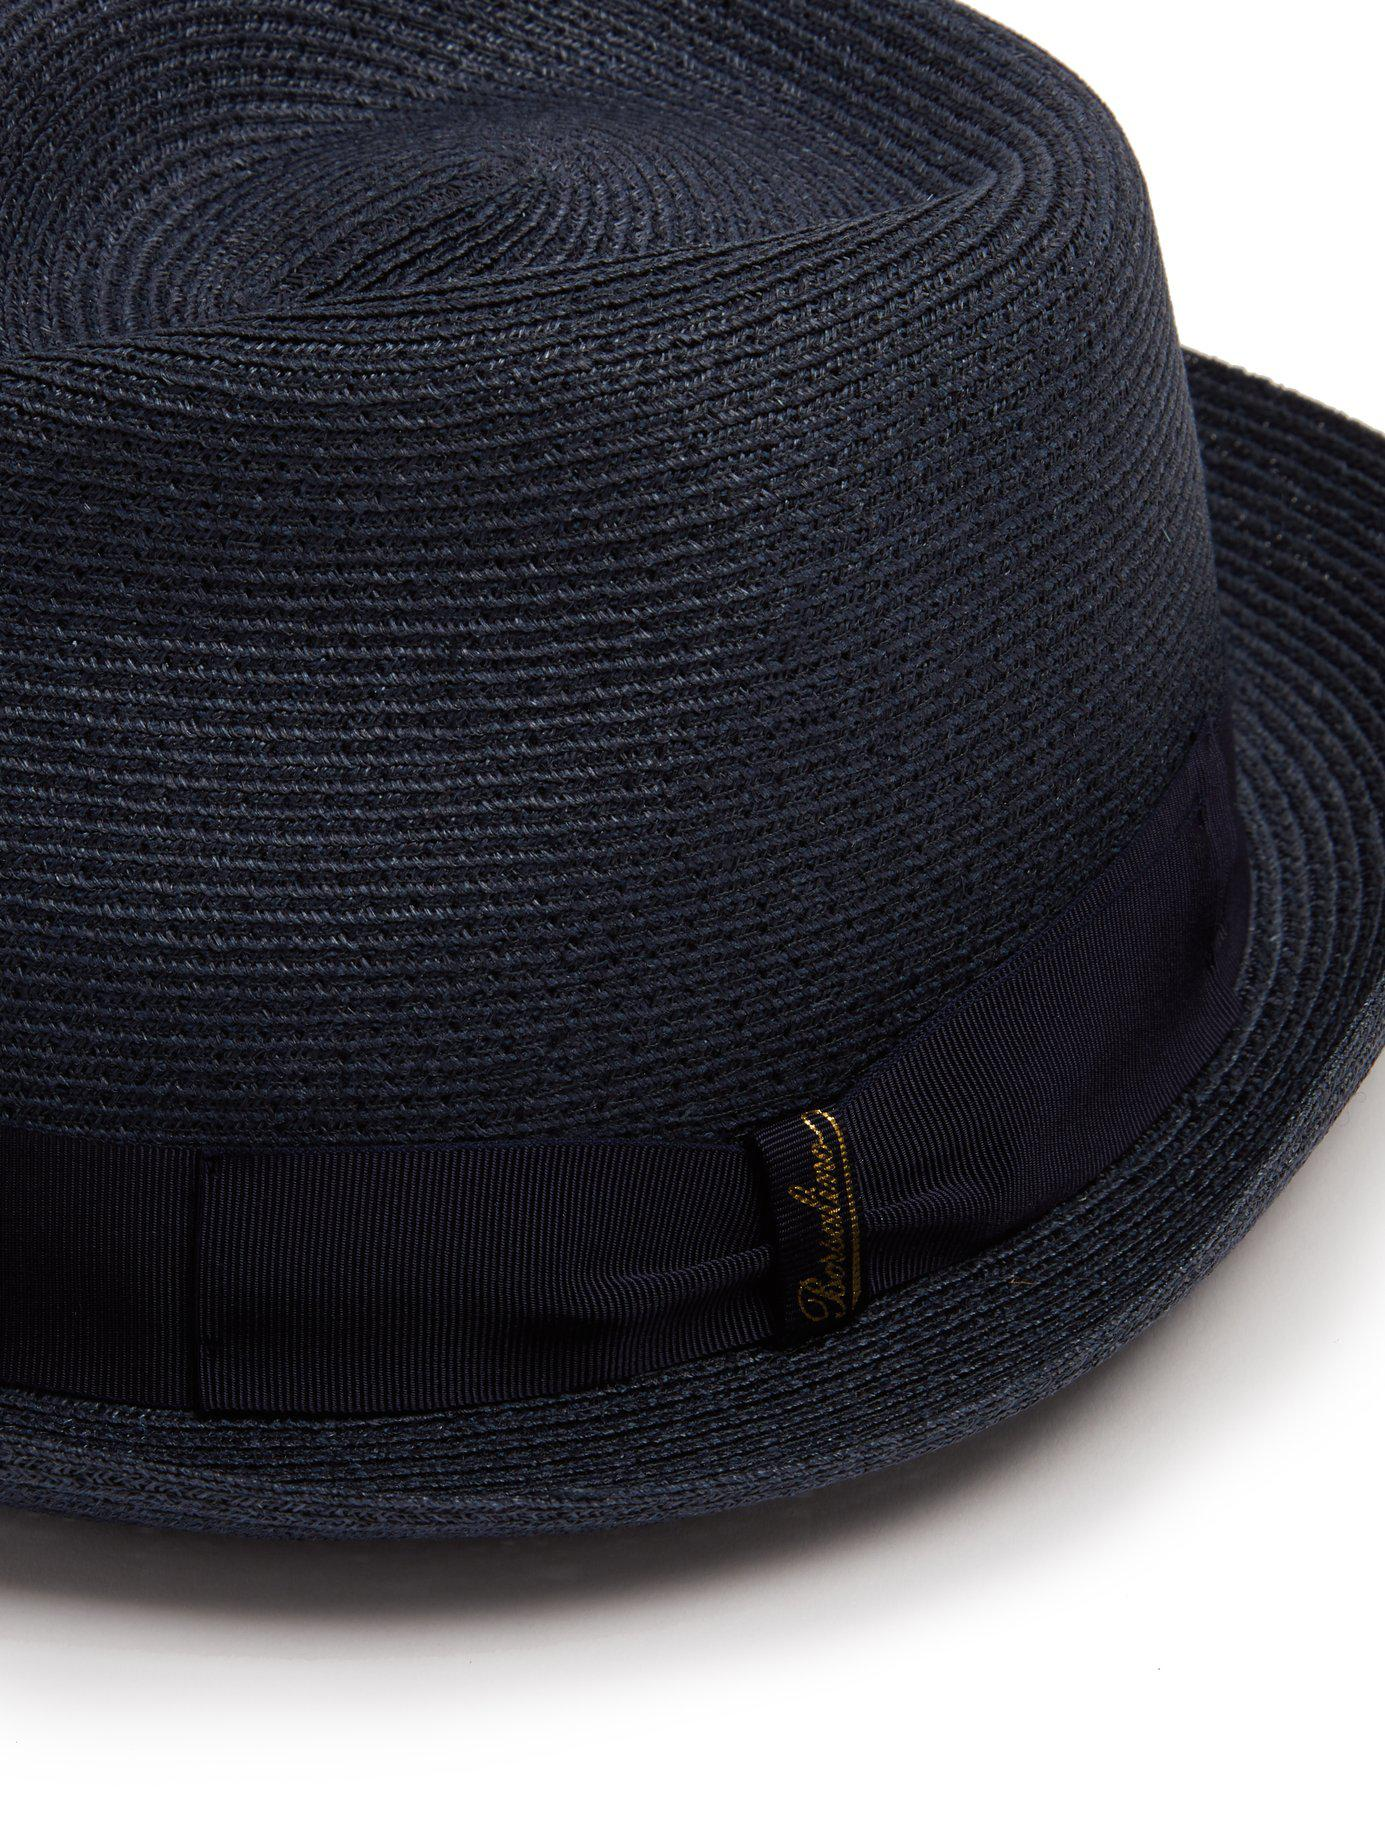 609288ff555 Lyst - Borsalino Block Colour Panama Hat in Blue for Men